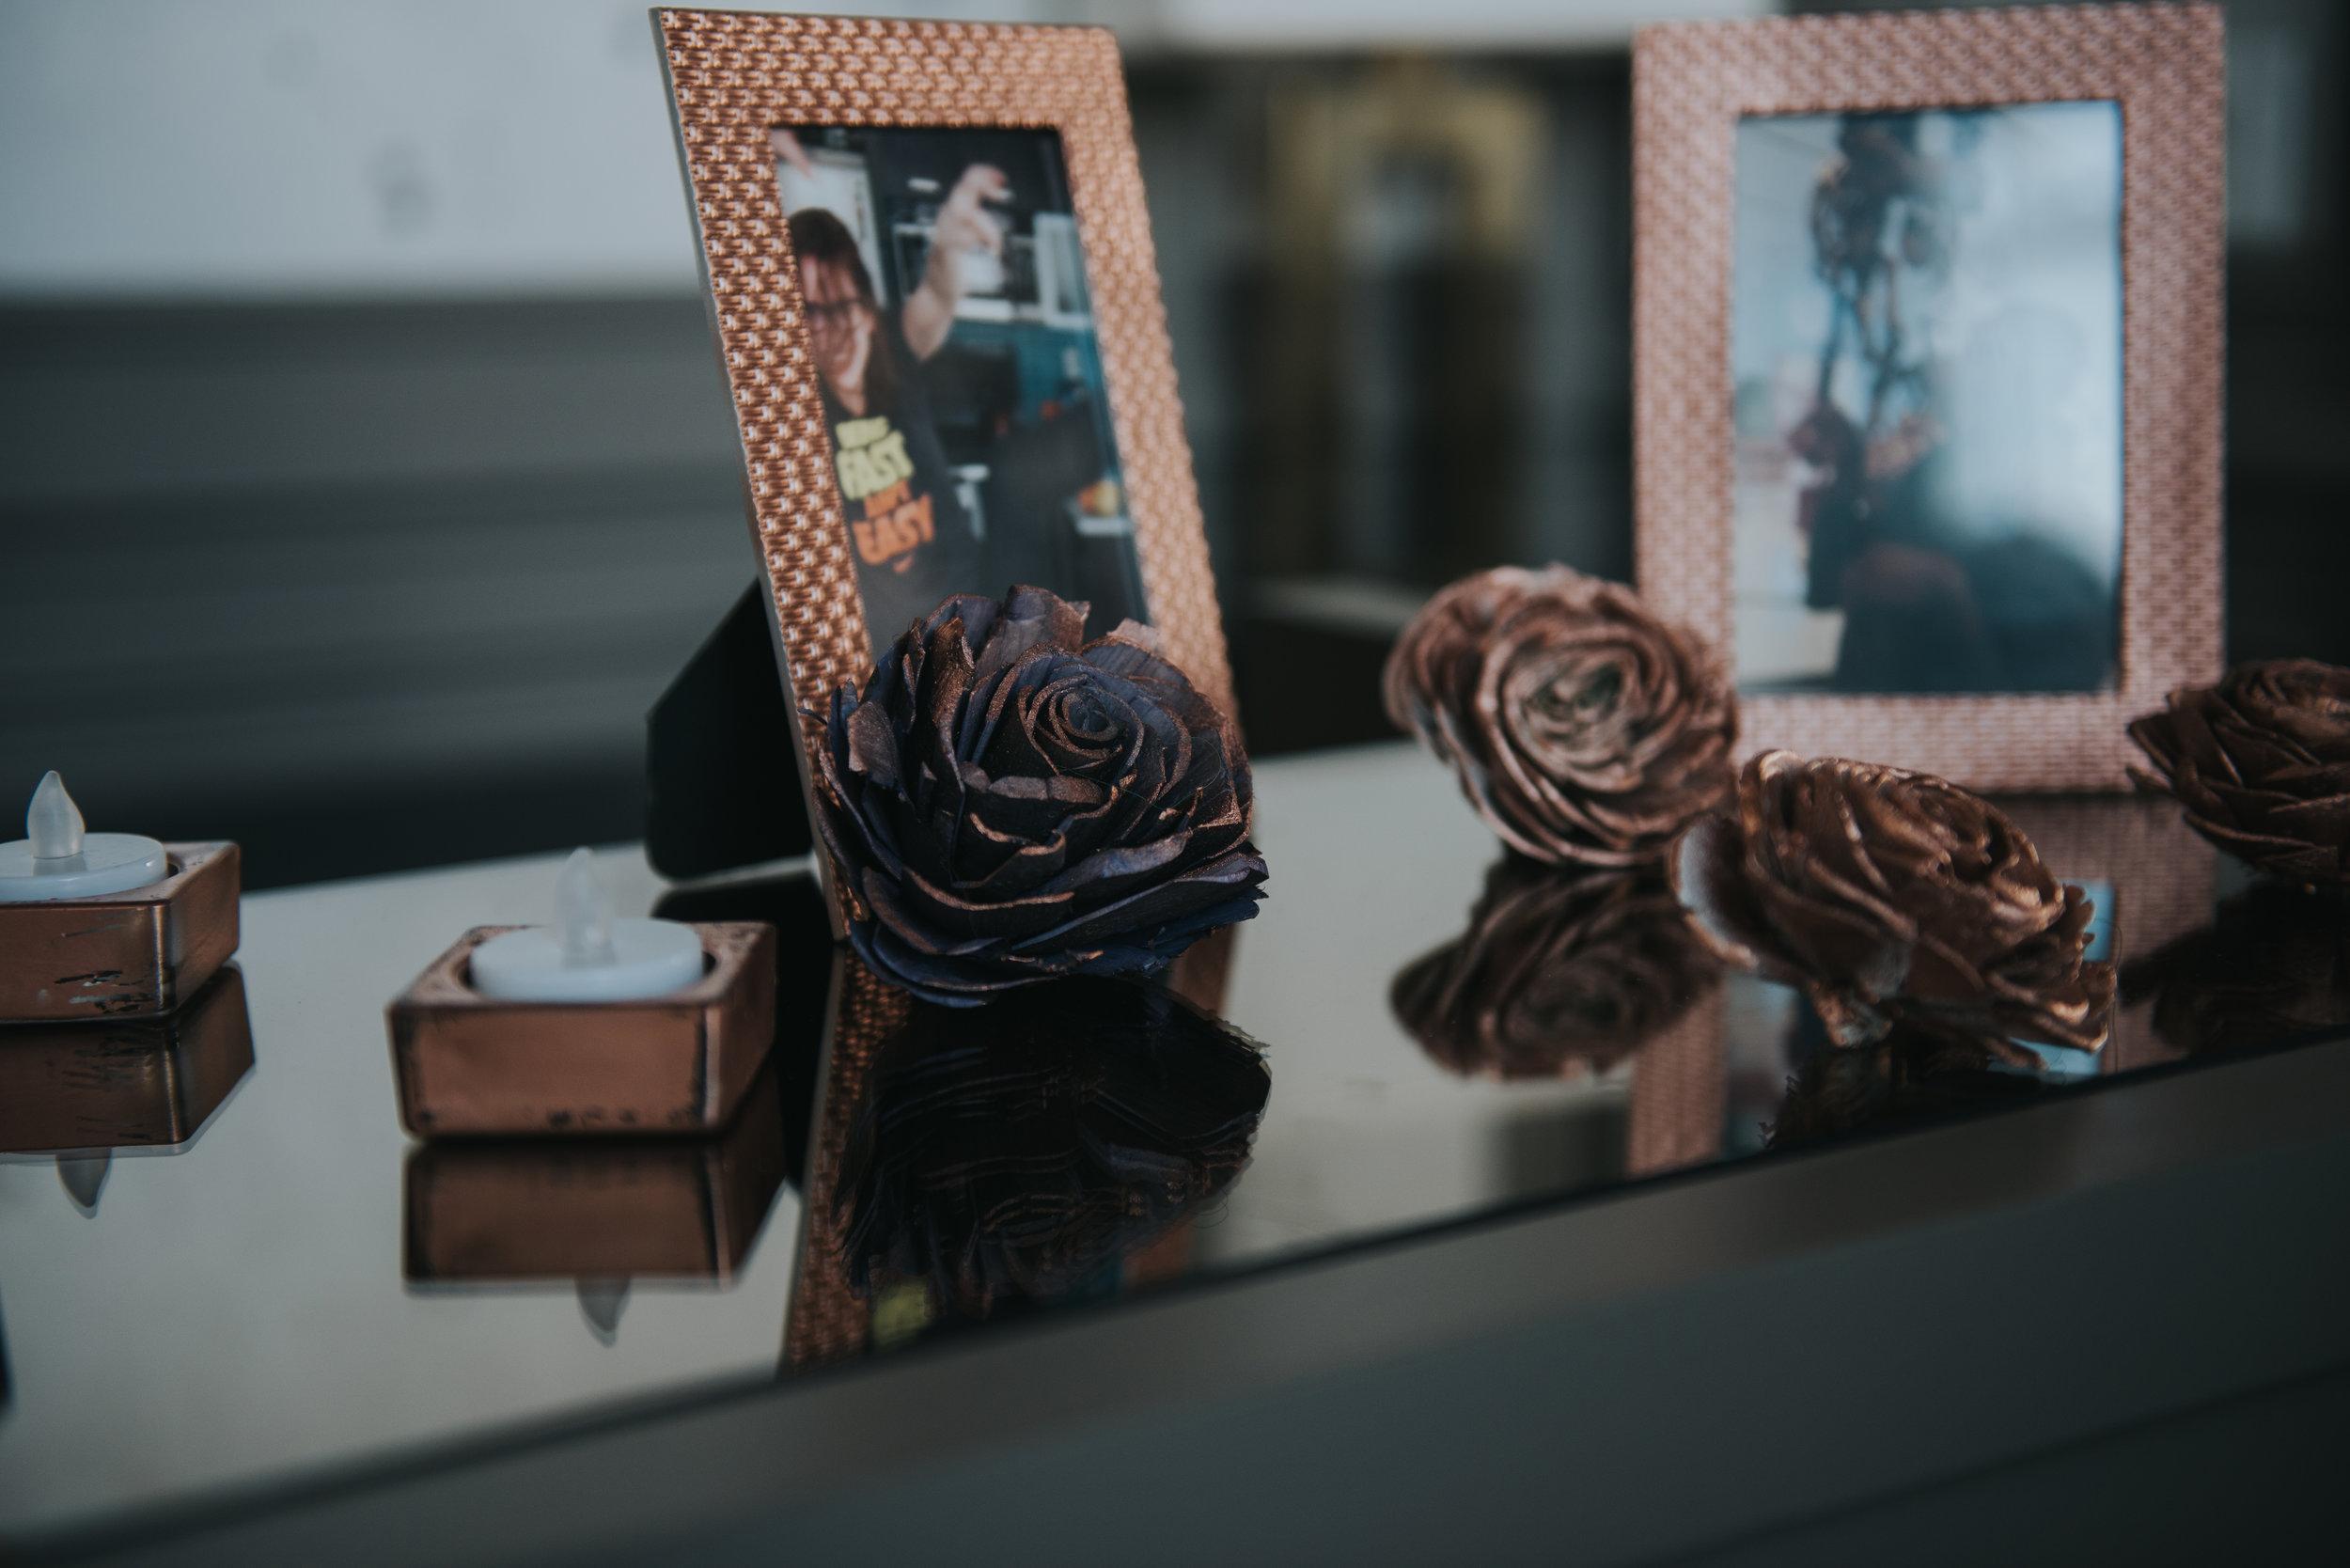 wedding-details-toronto-outdoor-summer-wedding-documentary-wedding-photography-by-willow-birch-photo.jpg